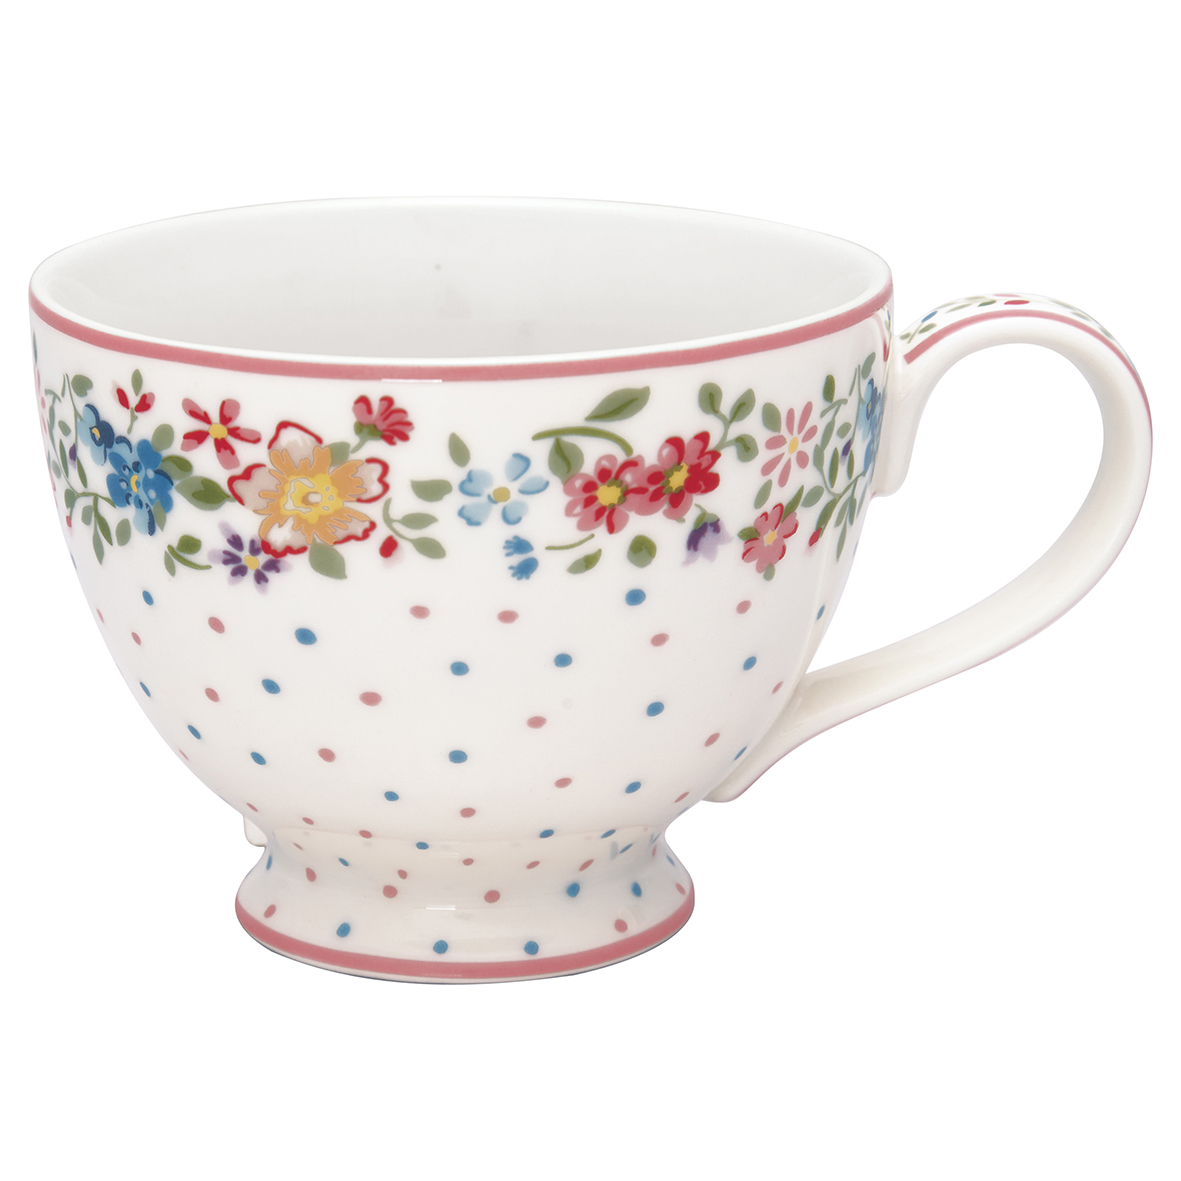 Greengate Teacup Belle white Becher